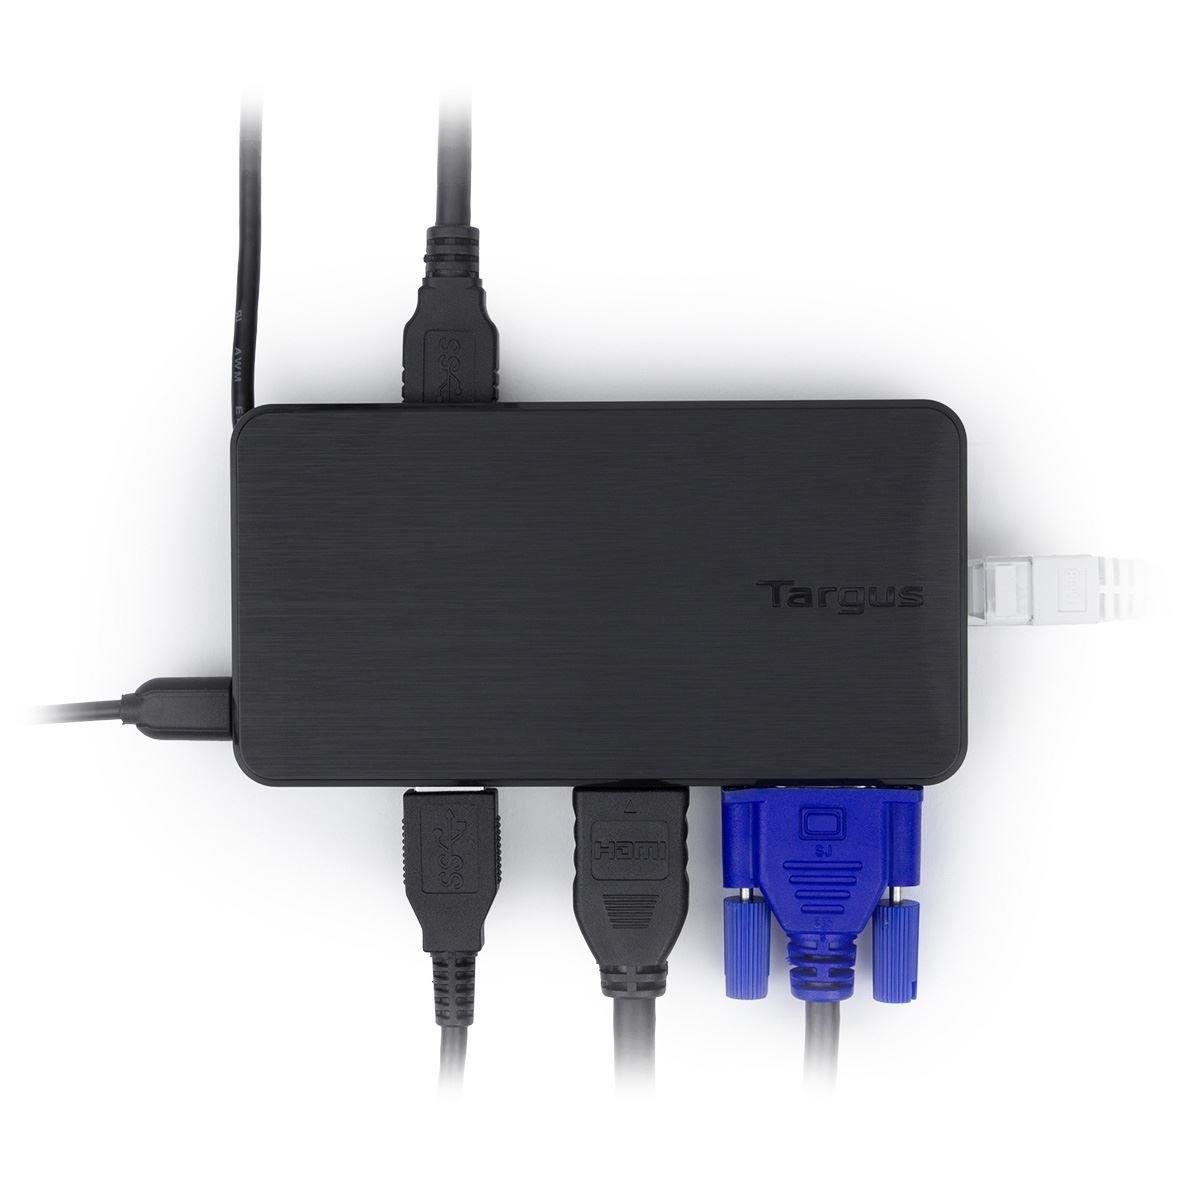 Targus USB Multi-Display Adapter Black, ACA928EUZ (Black) by Targus